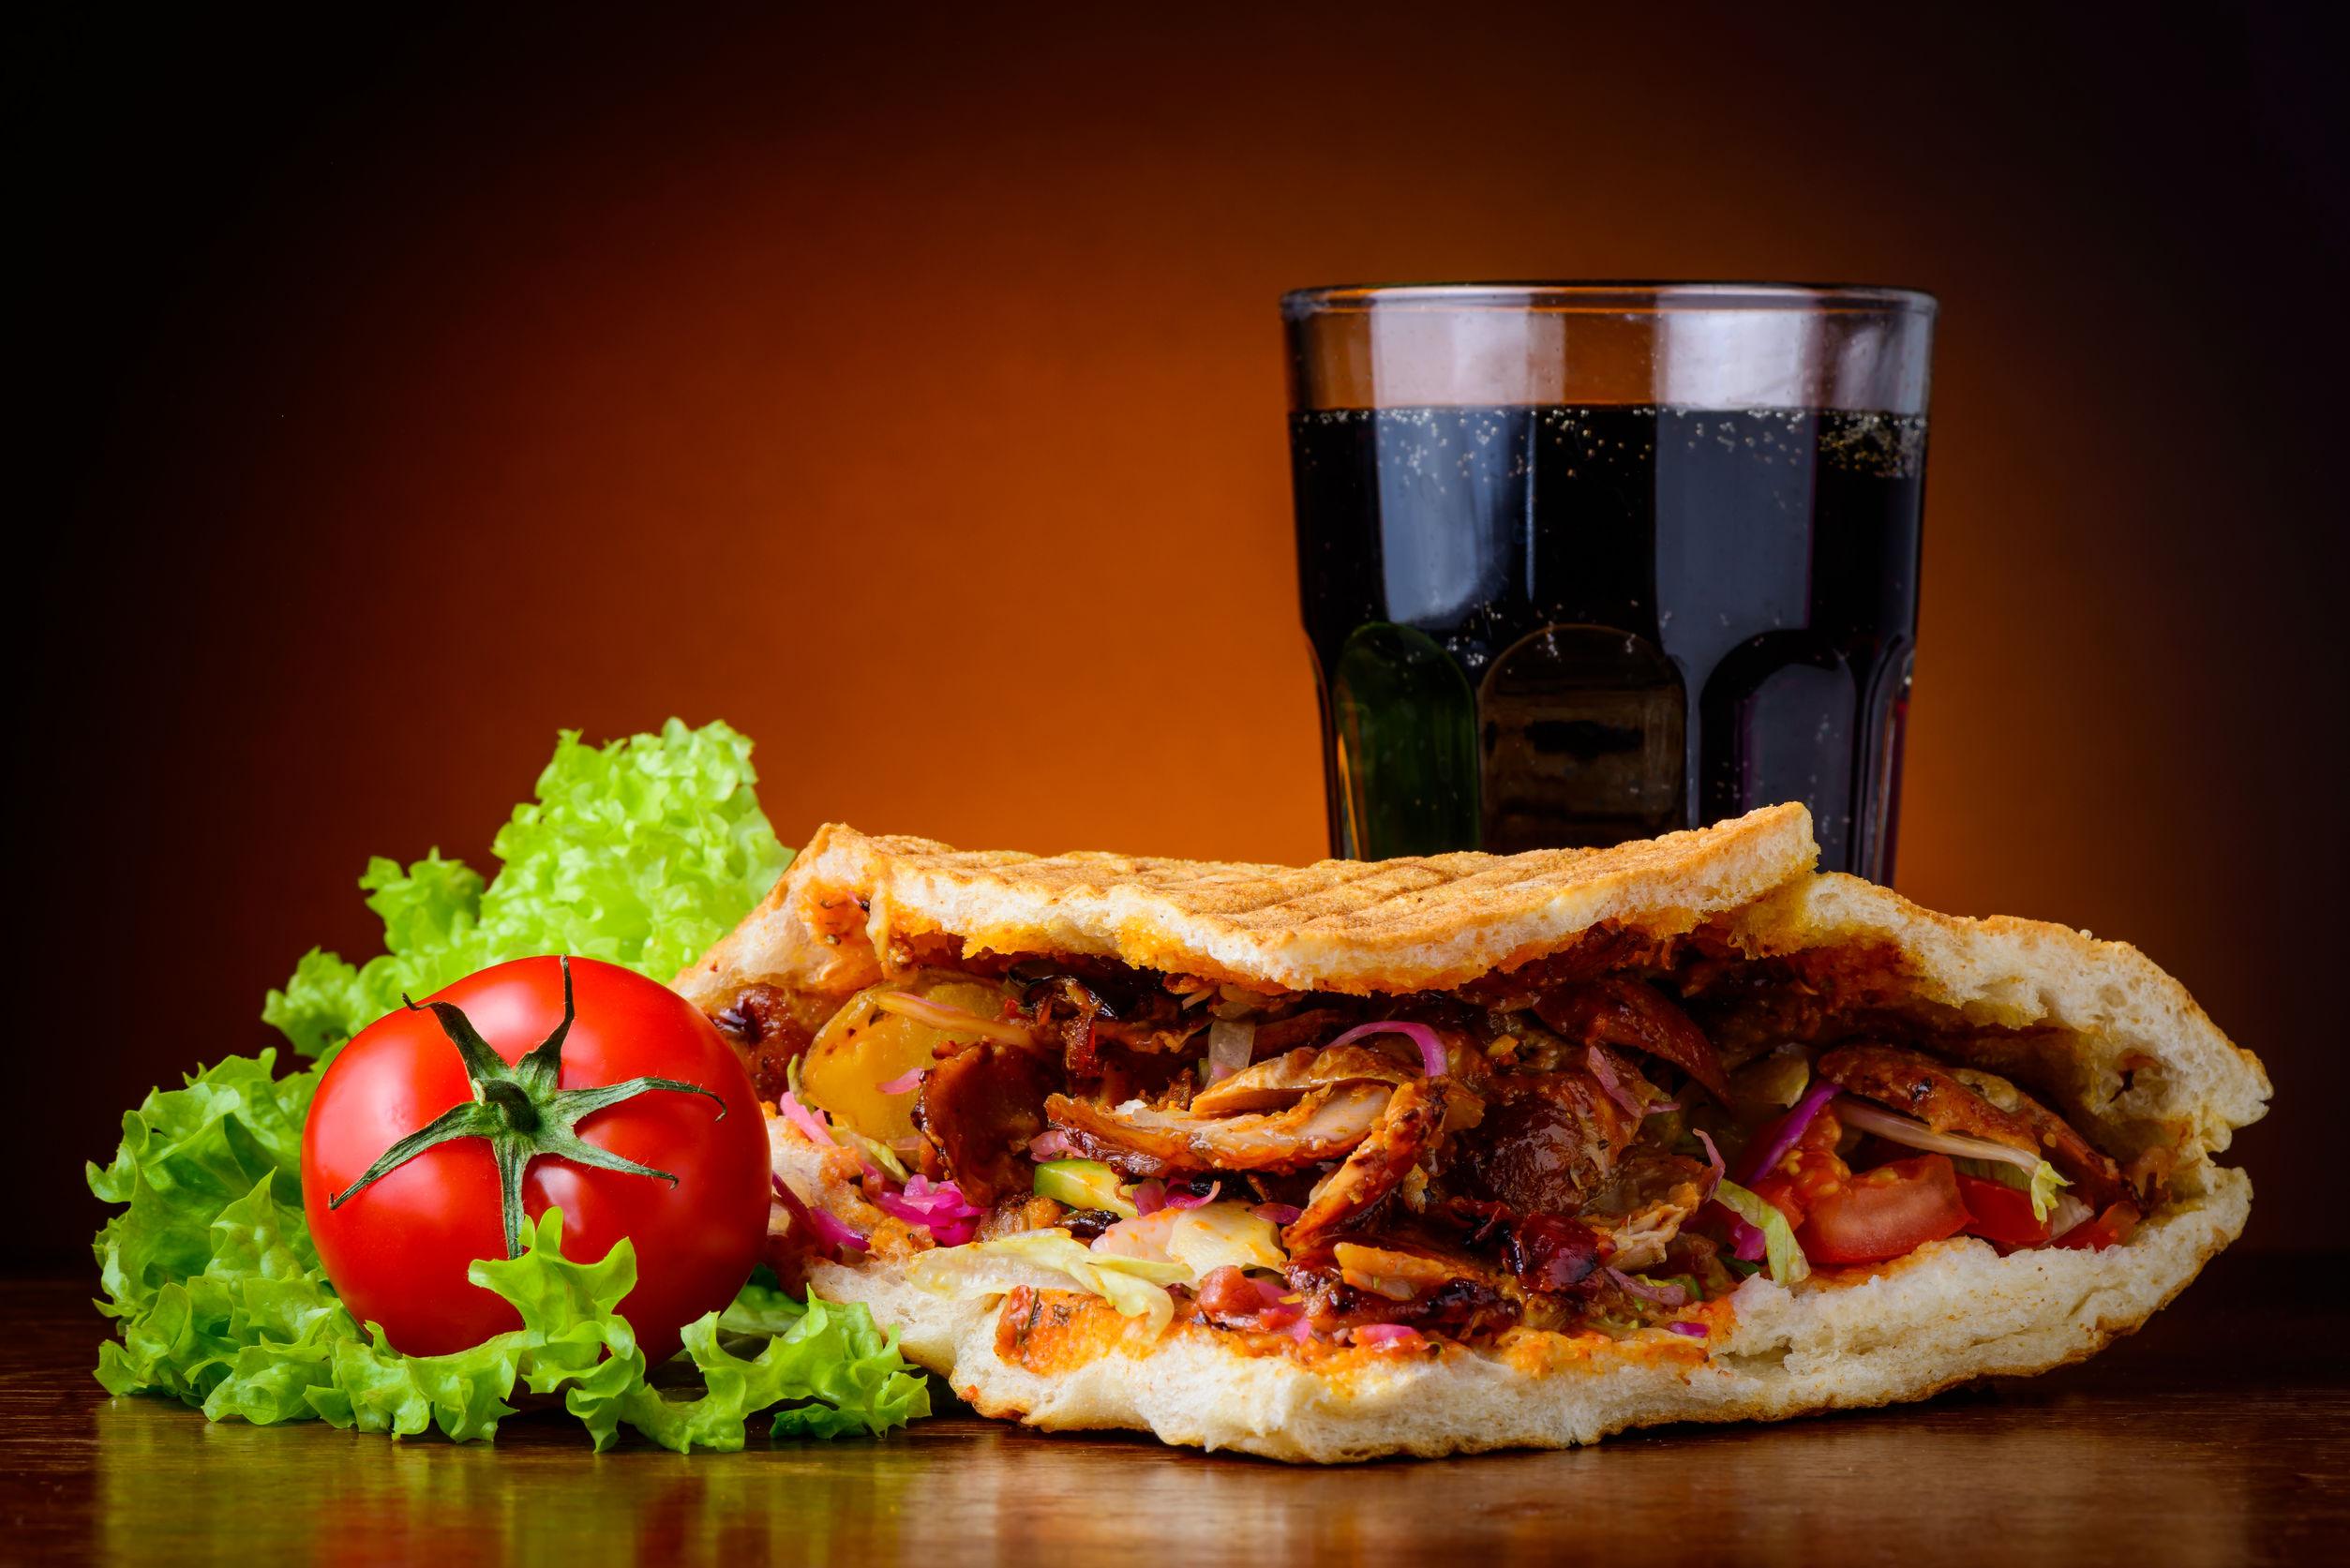 still life with doner kebab, fresh vegetables and cola drink